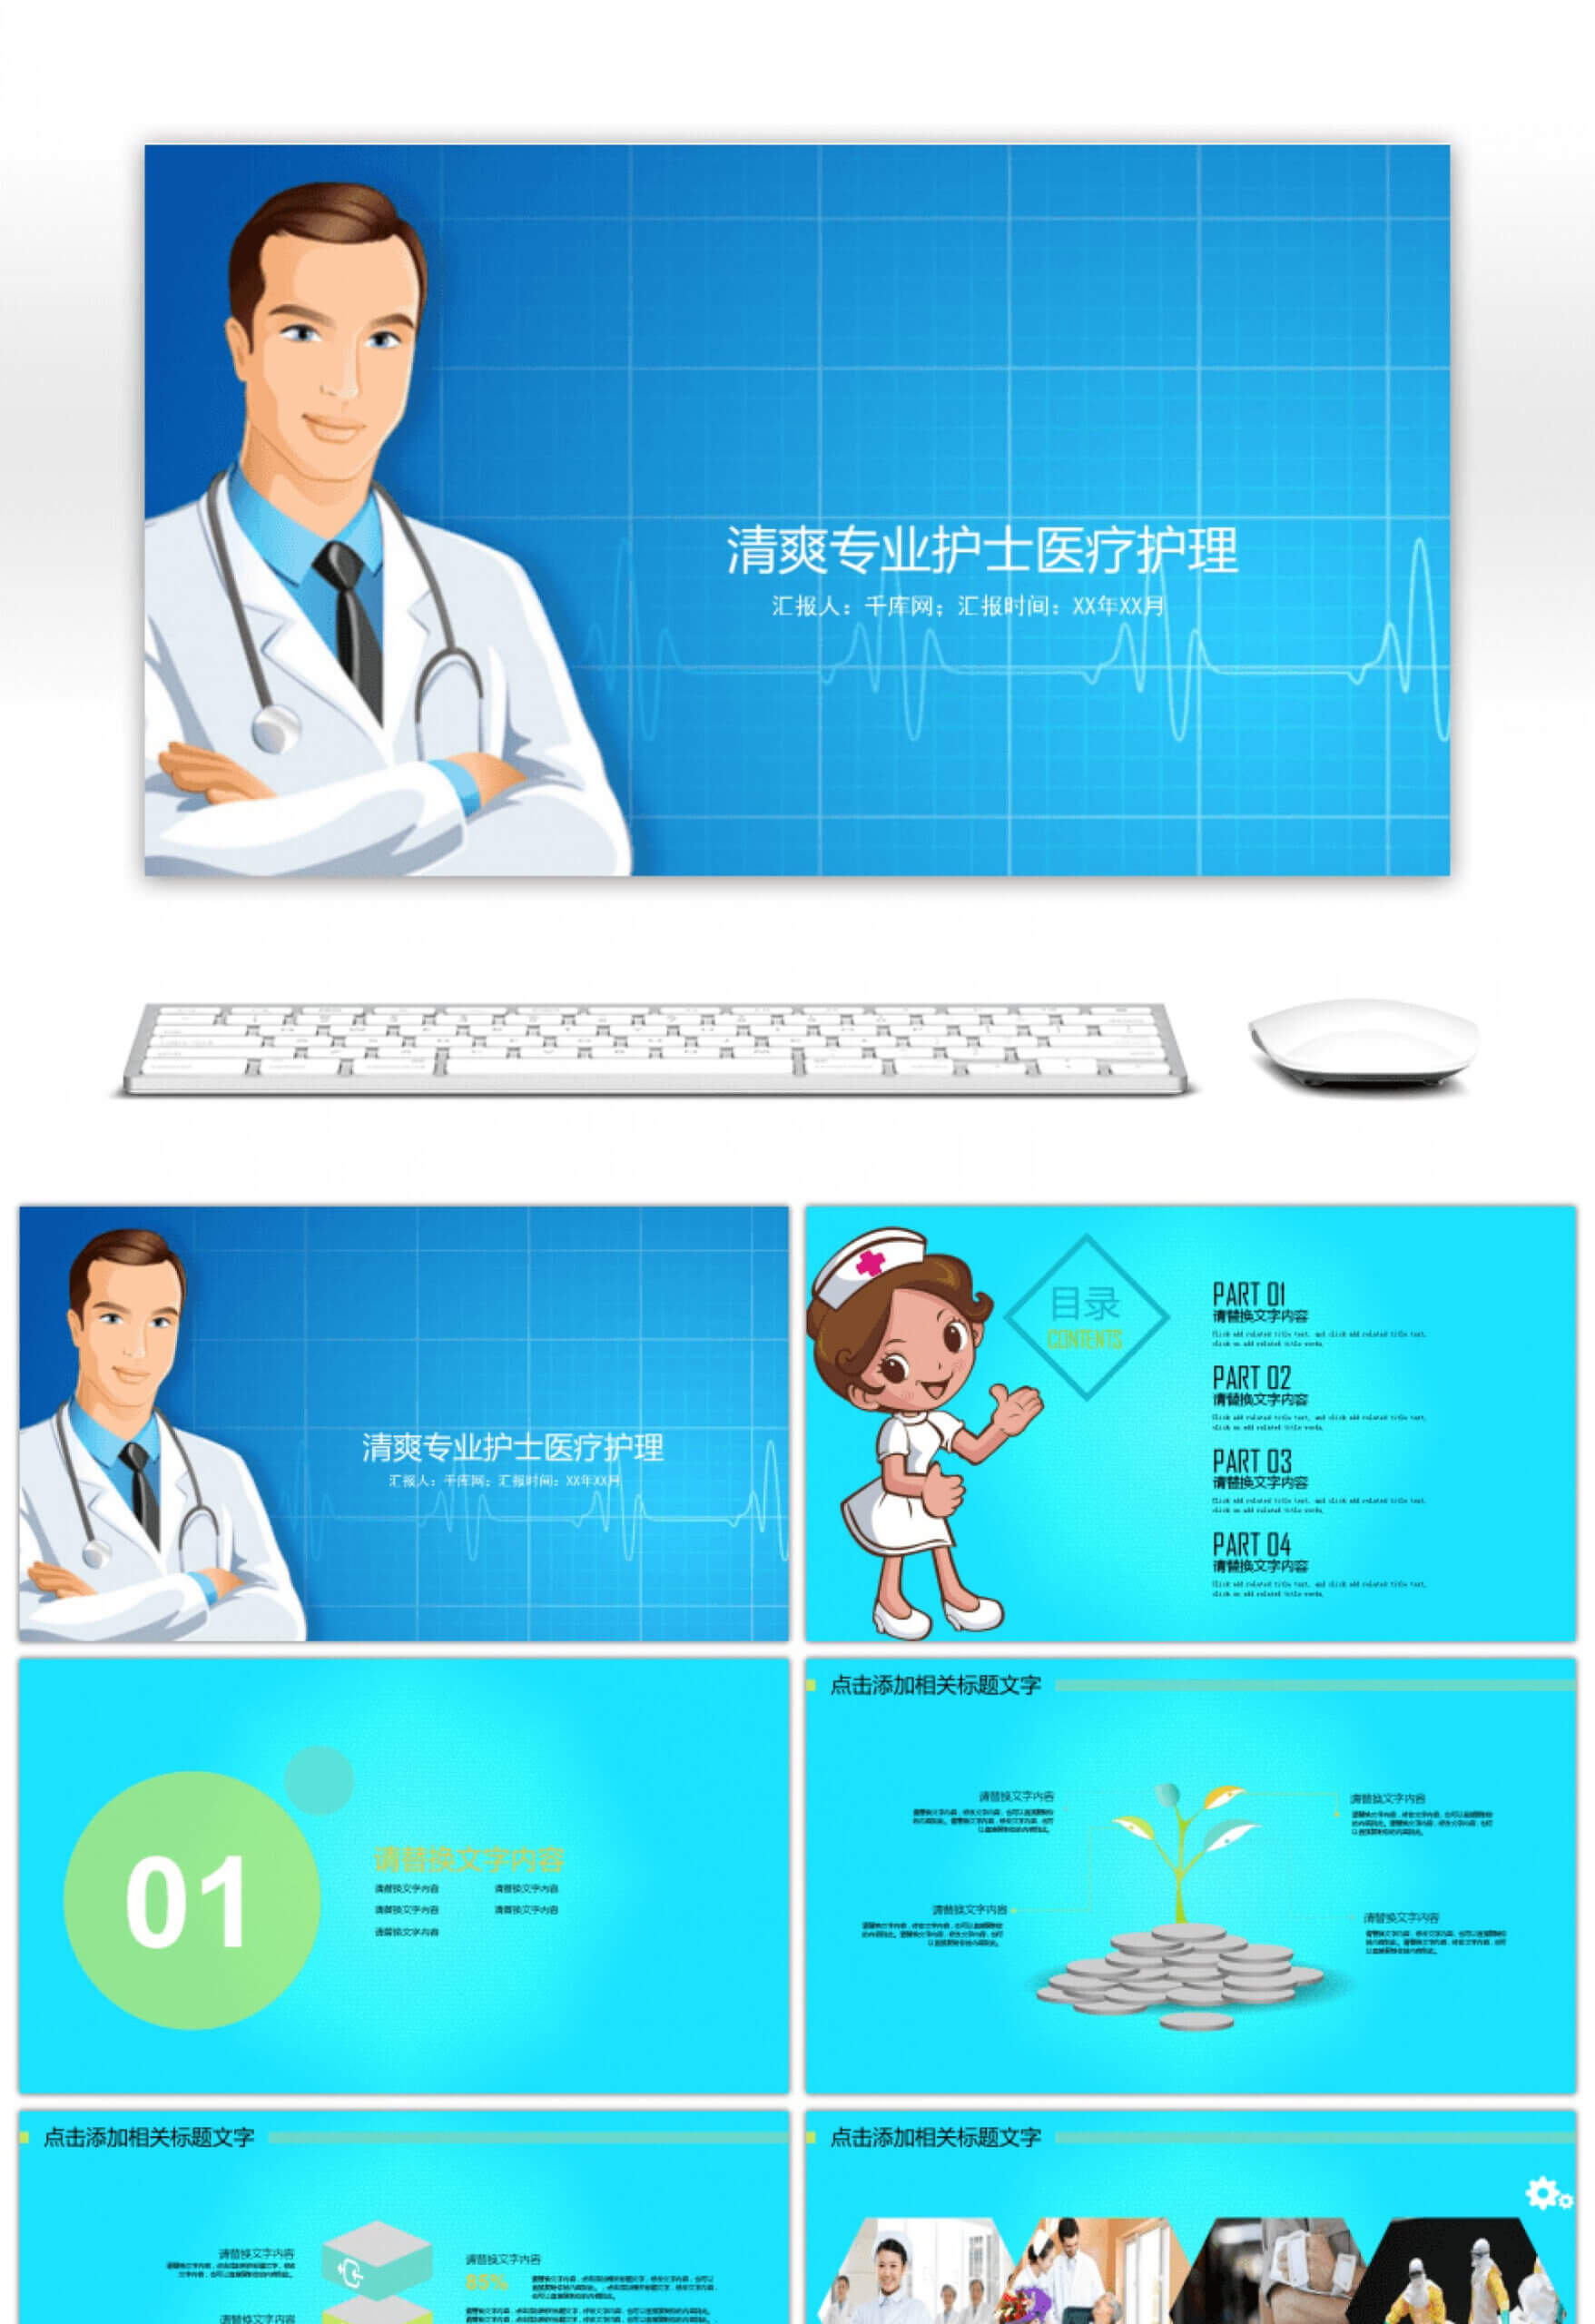 006 Jpg Free Nursing Powerpoint Templates Template 1920X2799 For Free Nursing Powerpoint Templates